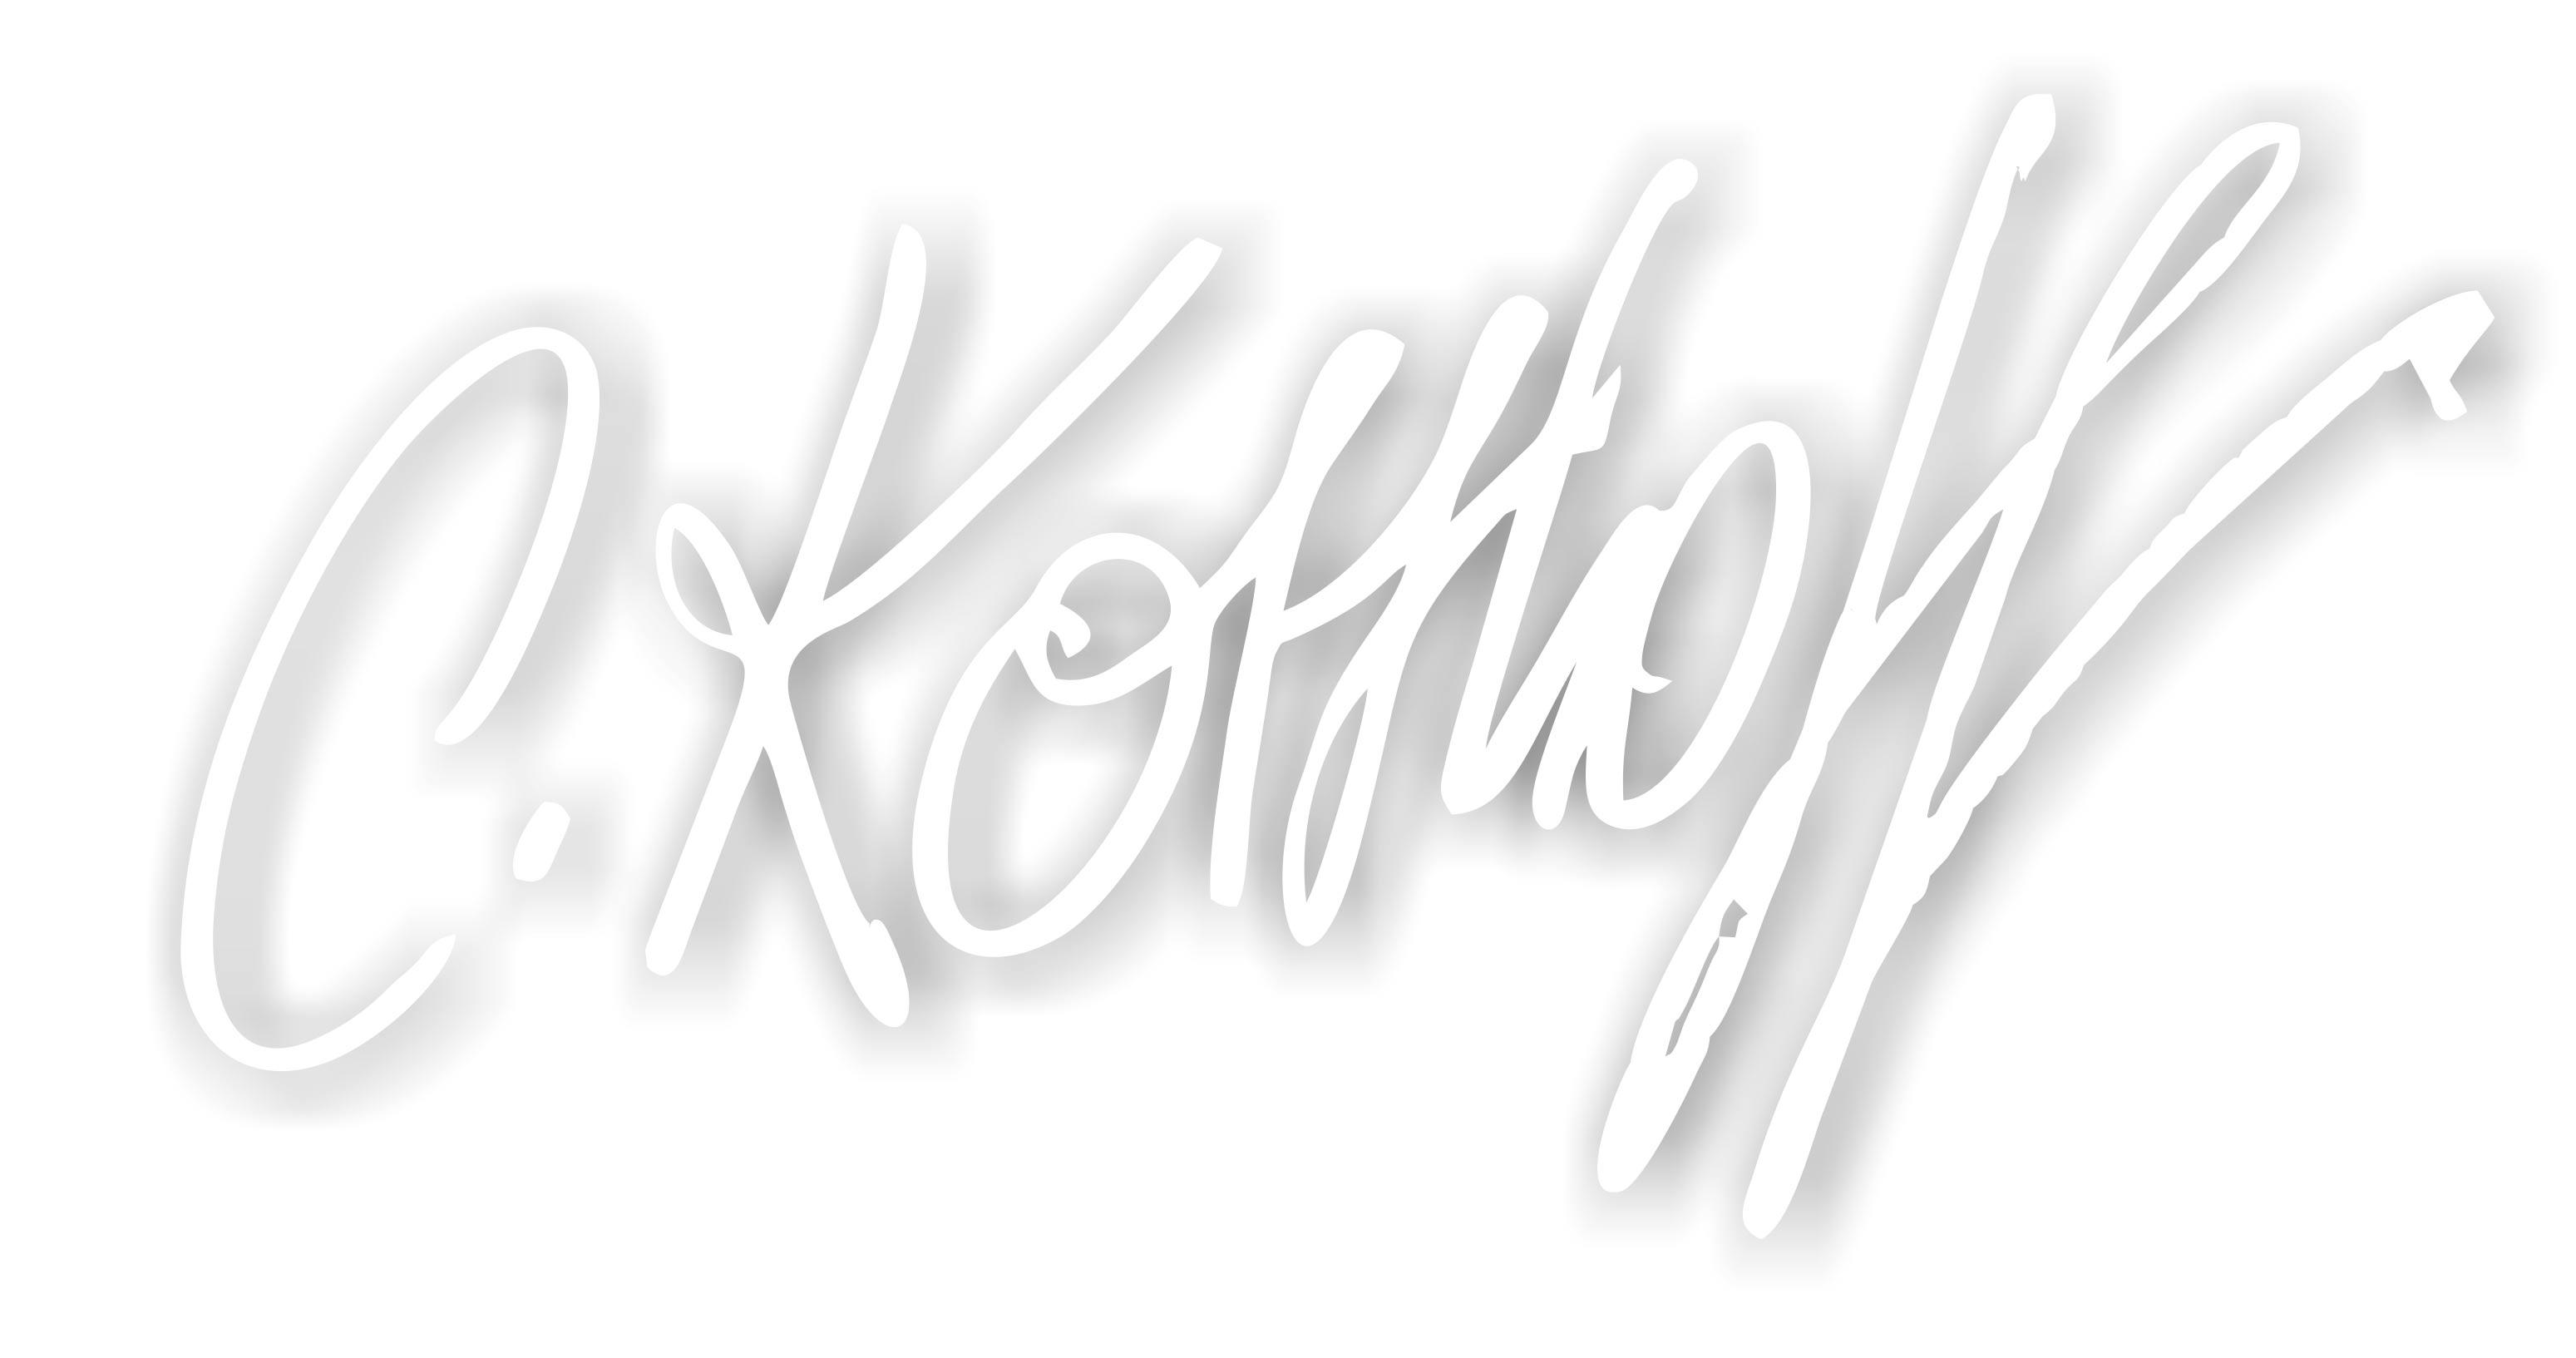 Die Kanzlei – Christian Kotthoff Steuerberater